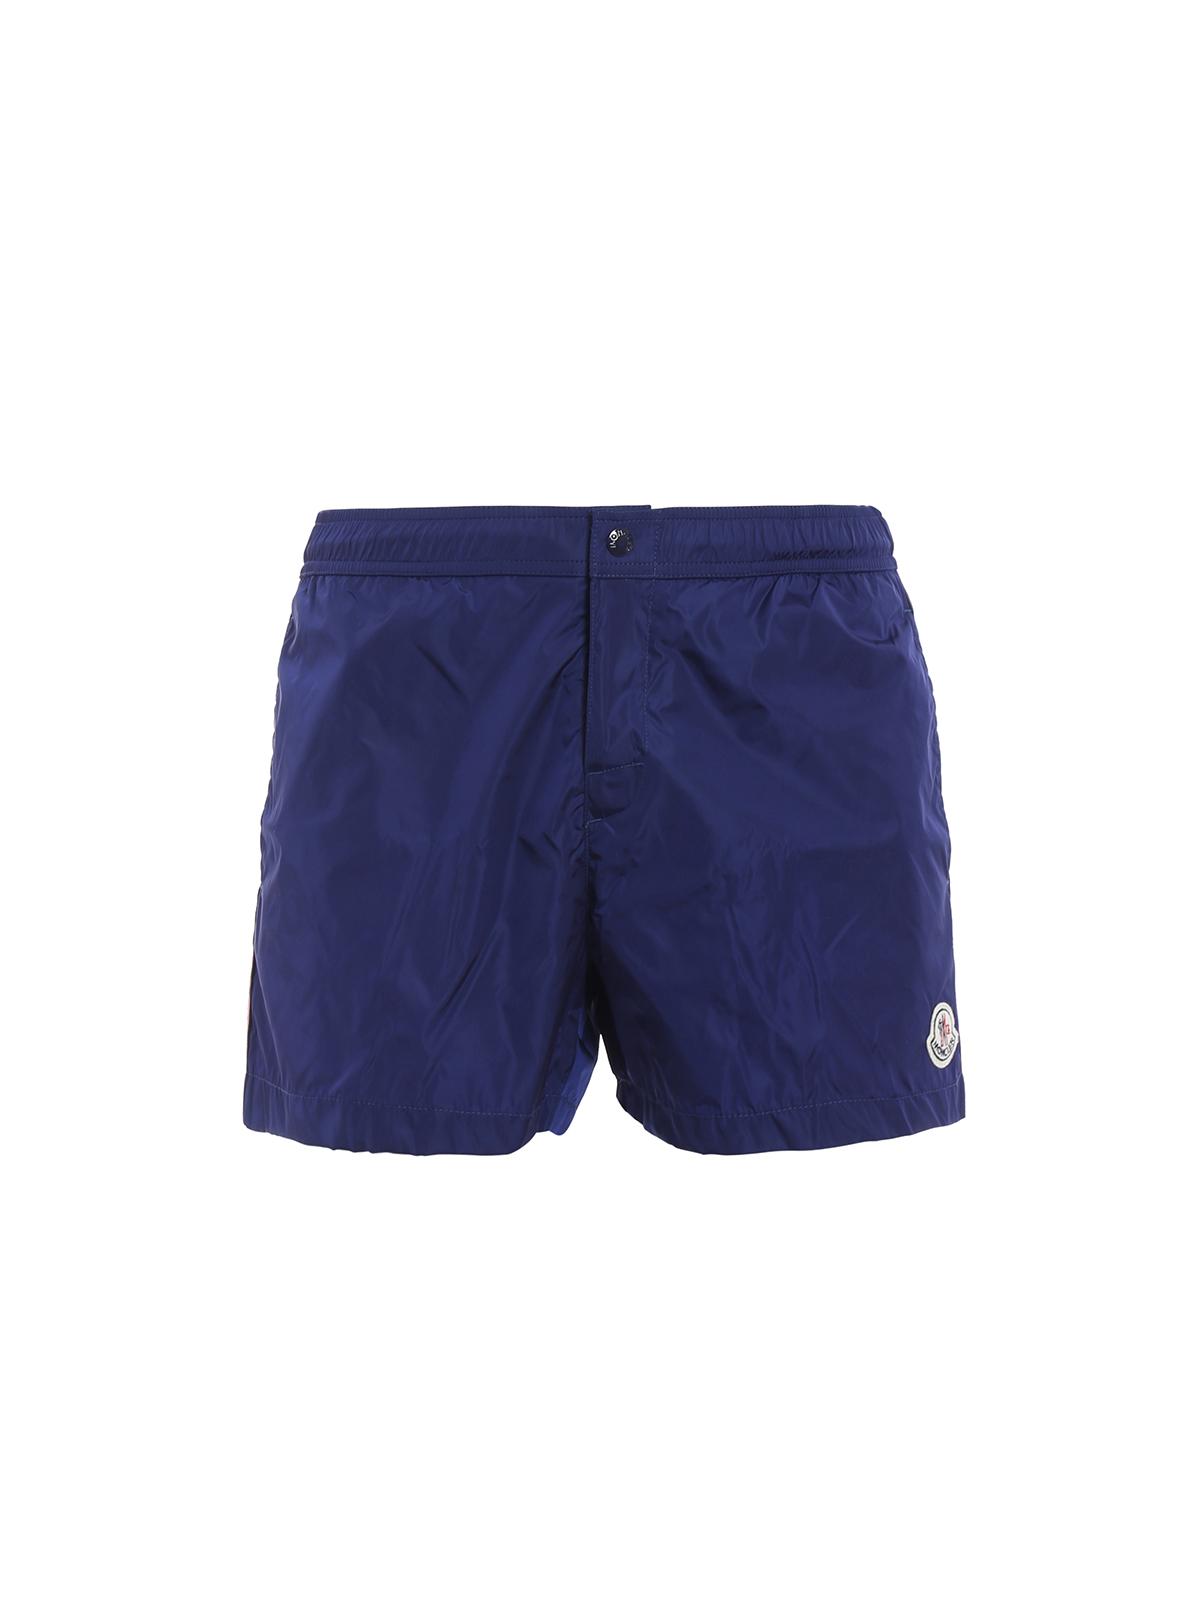 03e978c4dbee Moncler - Short De Bain Bleu Pour Homme - Shorts de bain - C1 091 ...